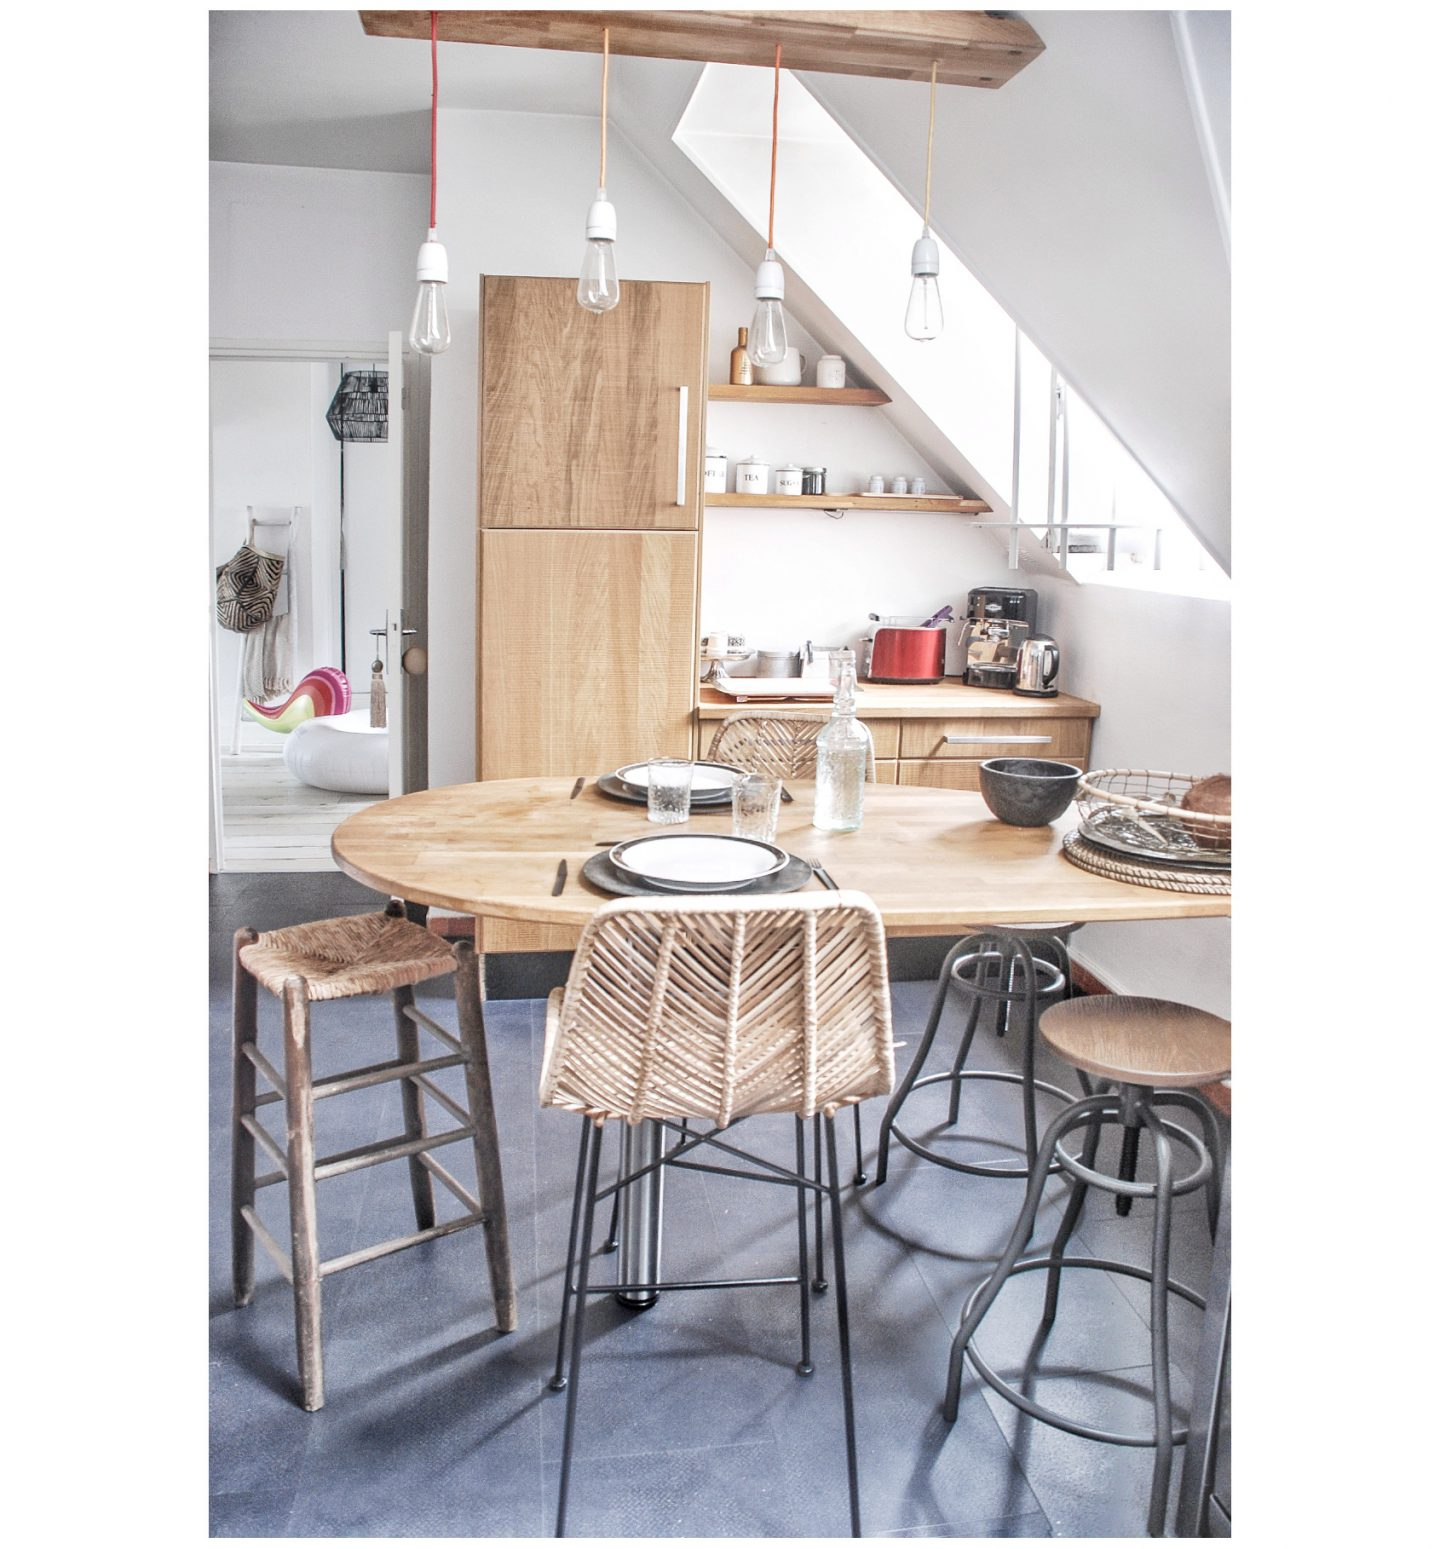 ideas para decoración de casas pequeñas